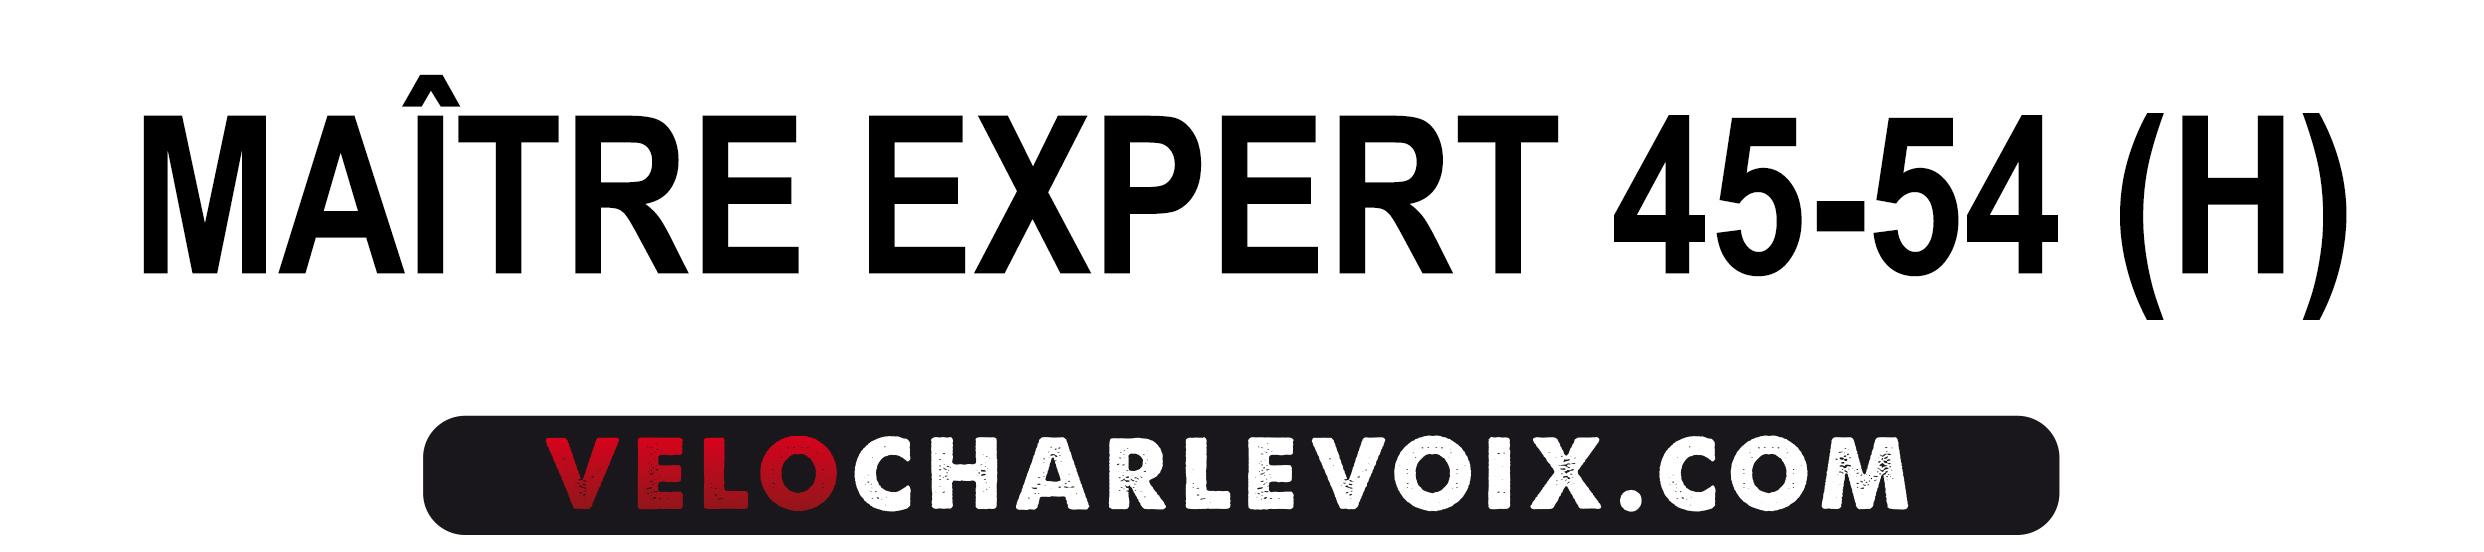 Categories Box Qc_Maitre expert 45-54 H